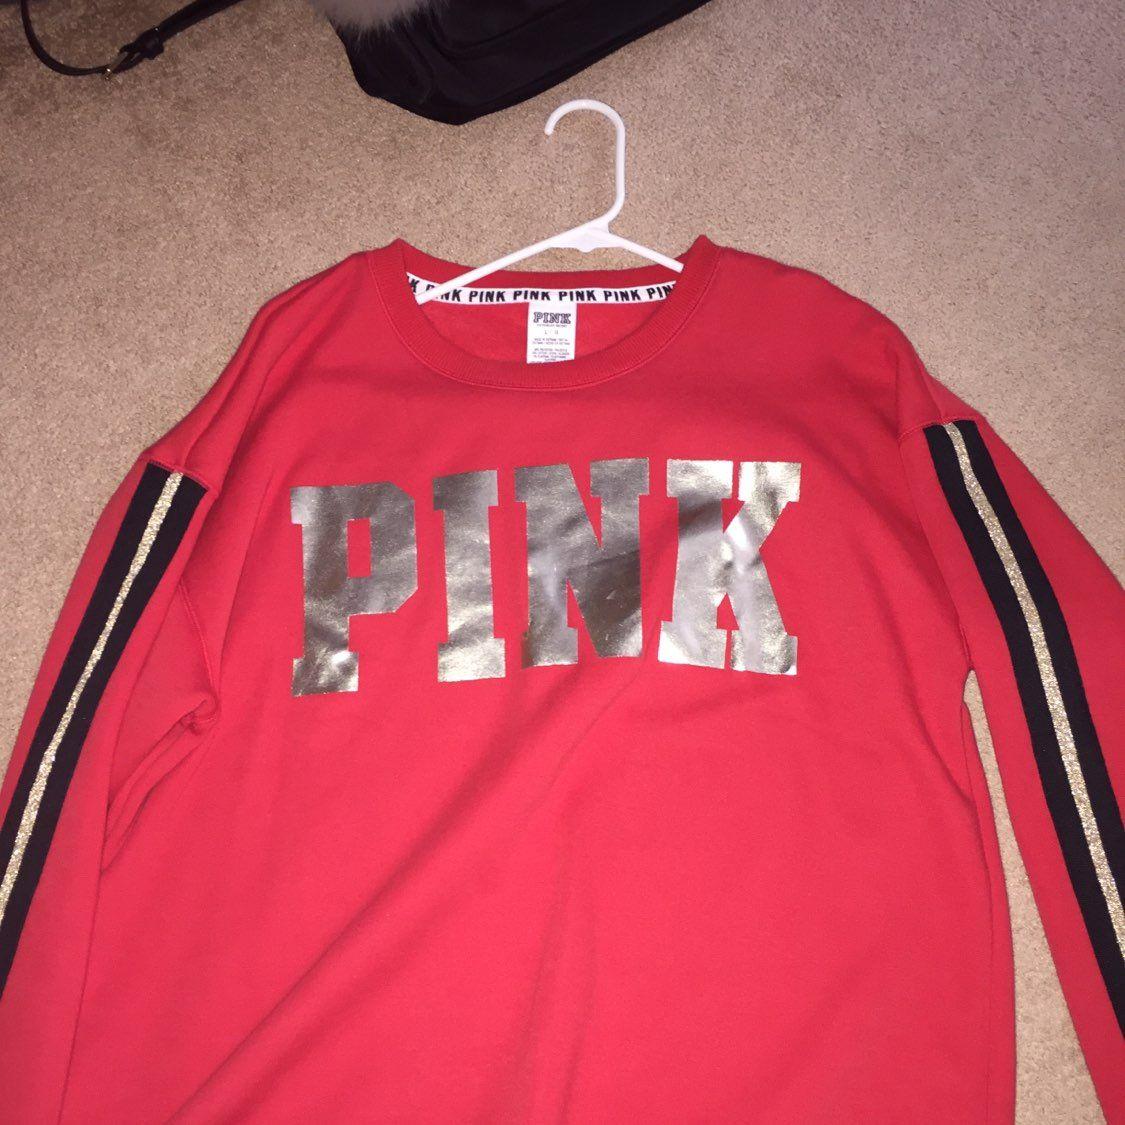 VS Pink sweater - Mercari: BUY & SELL THINGS YOU LOVE